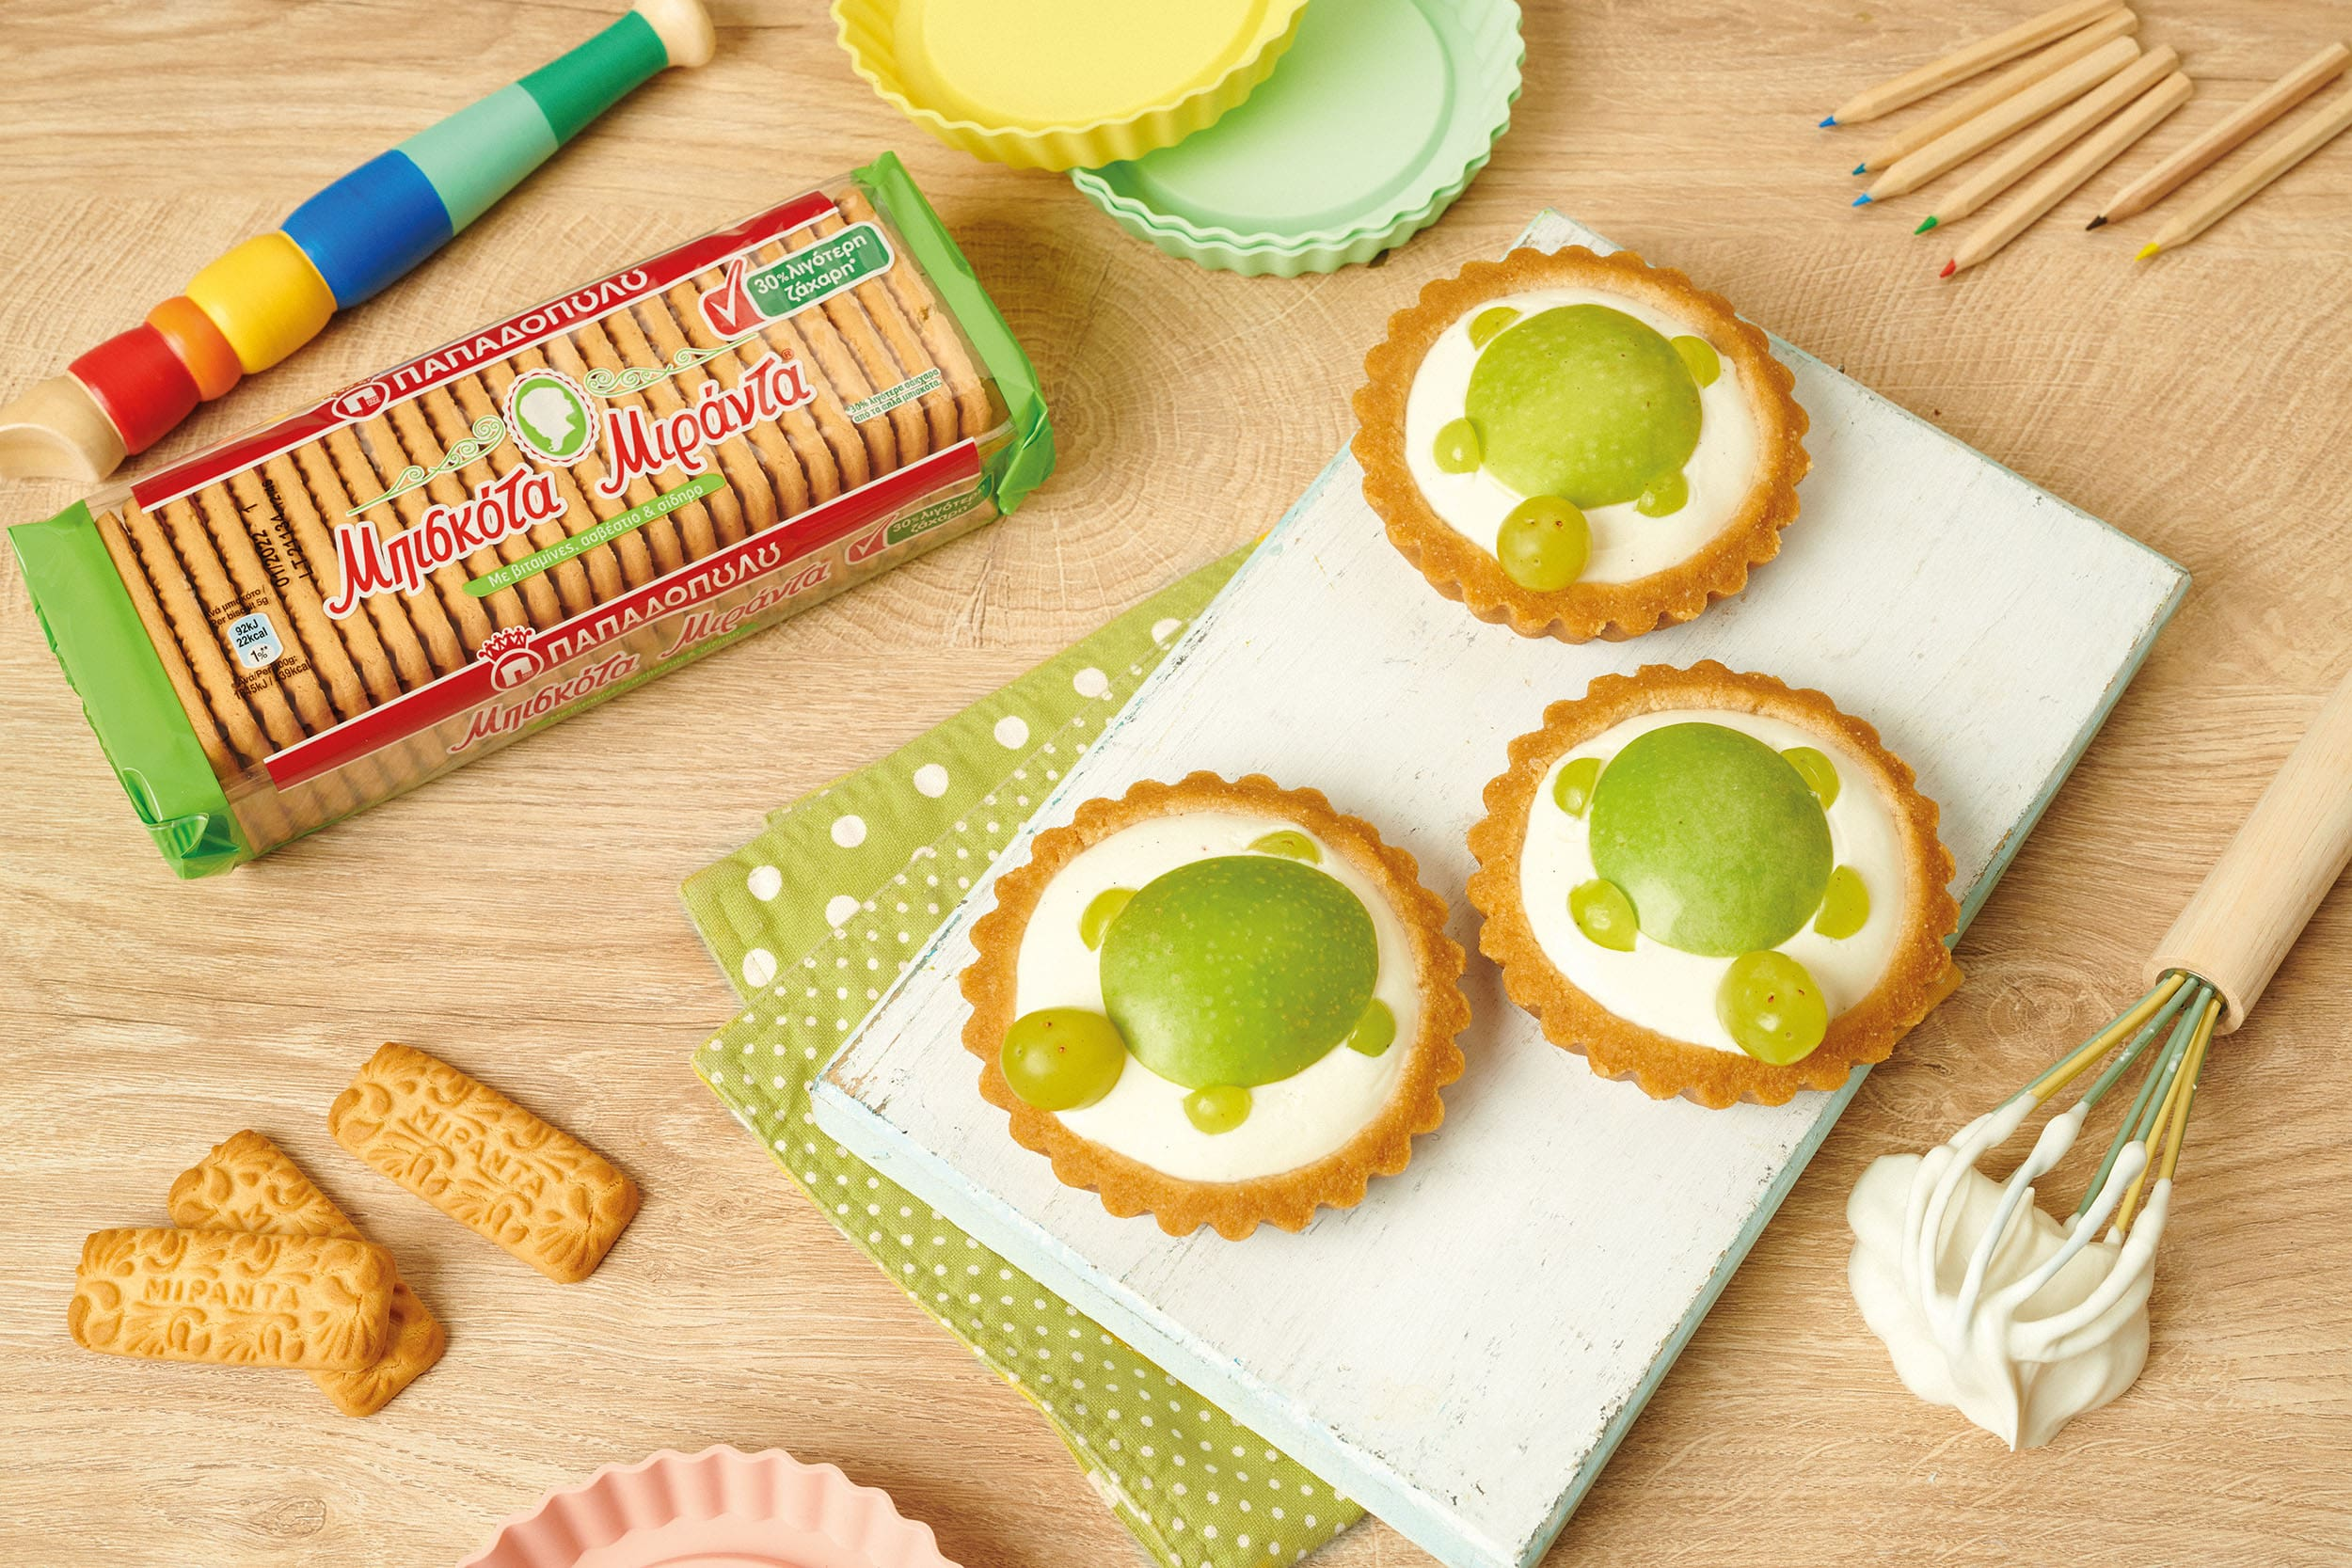 image for Ατομικά ταρτάκια με μήλο-αχλάδι και μπισκότα Μιράντα